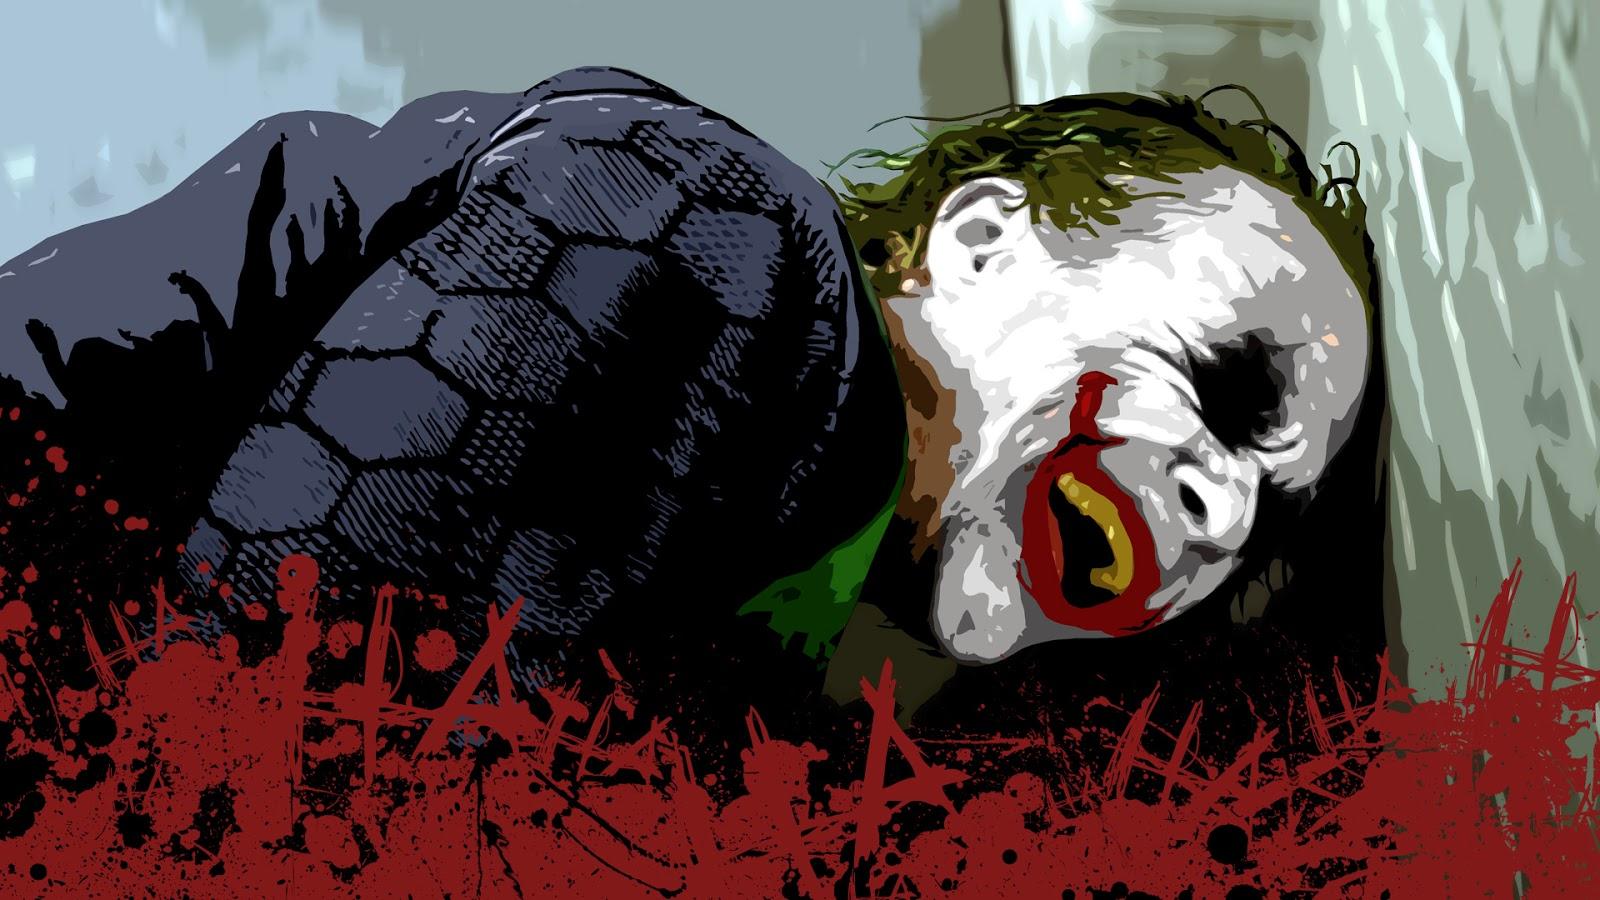 Wallpaper joker hd gratis download your title joker hd joker hd joker hd voltagebd Choice Image